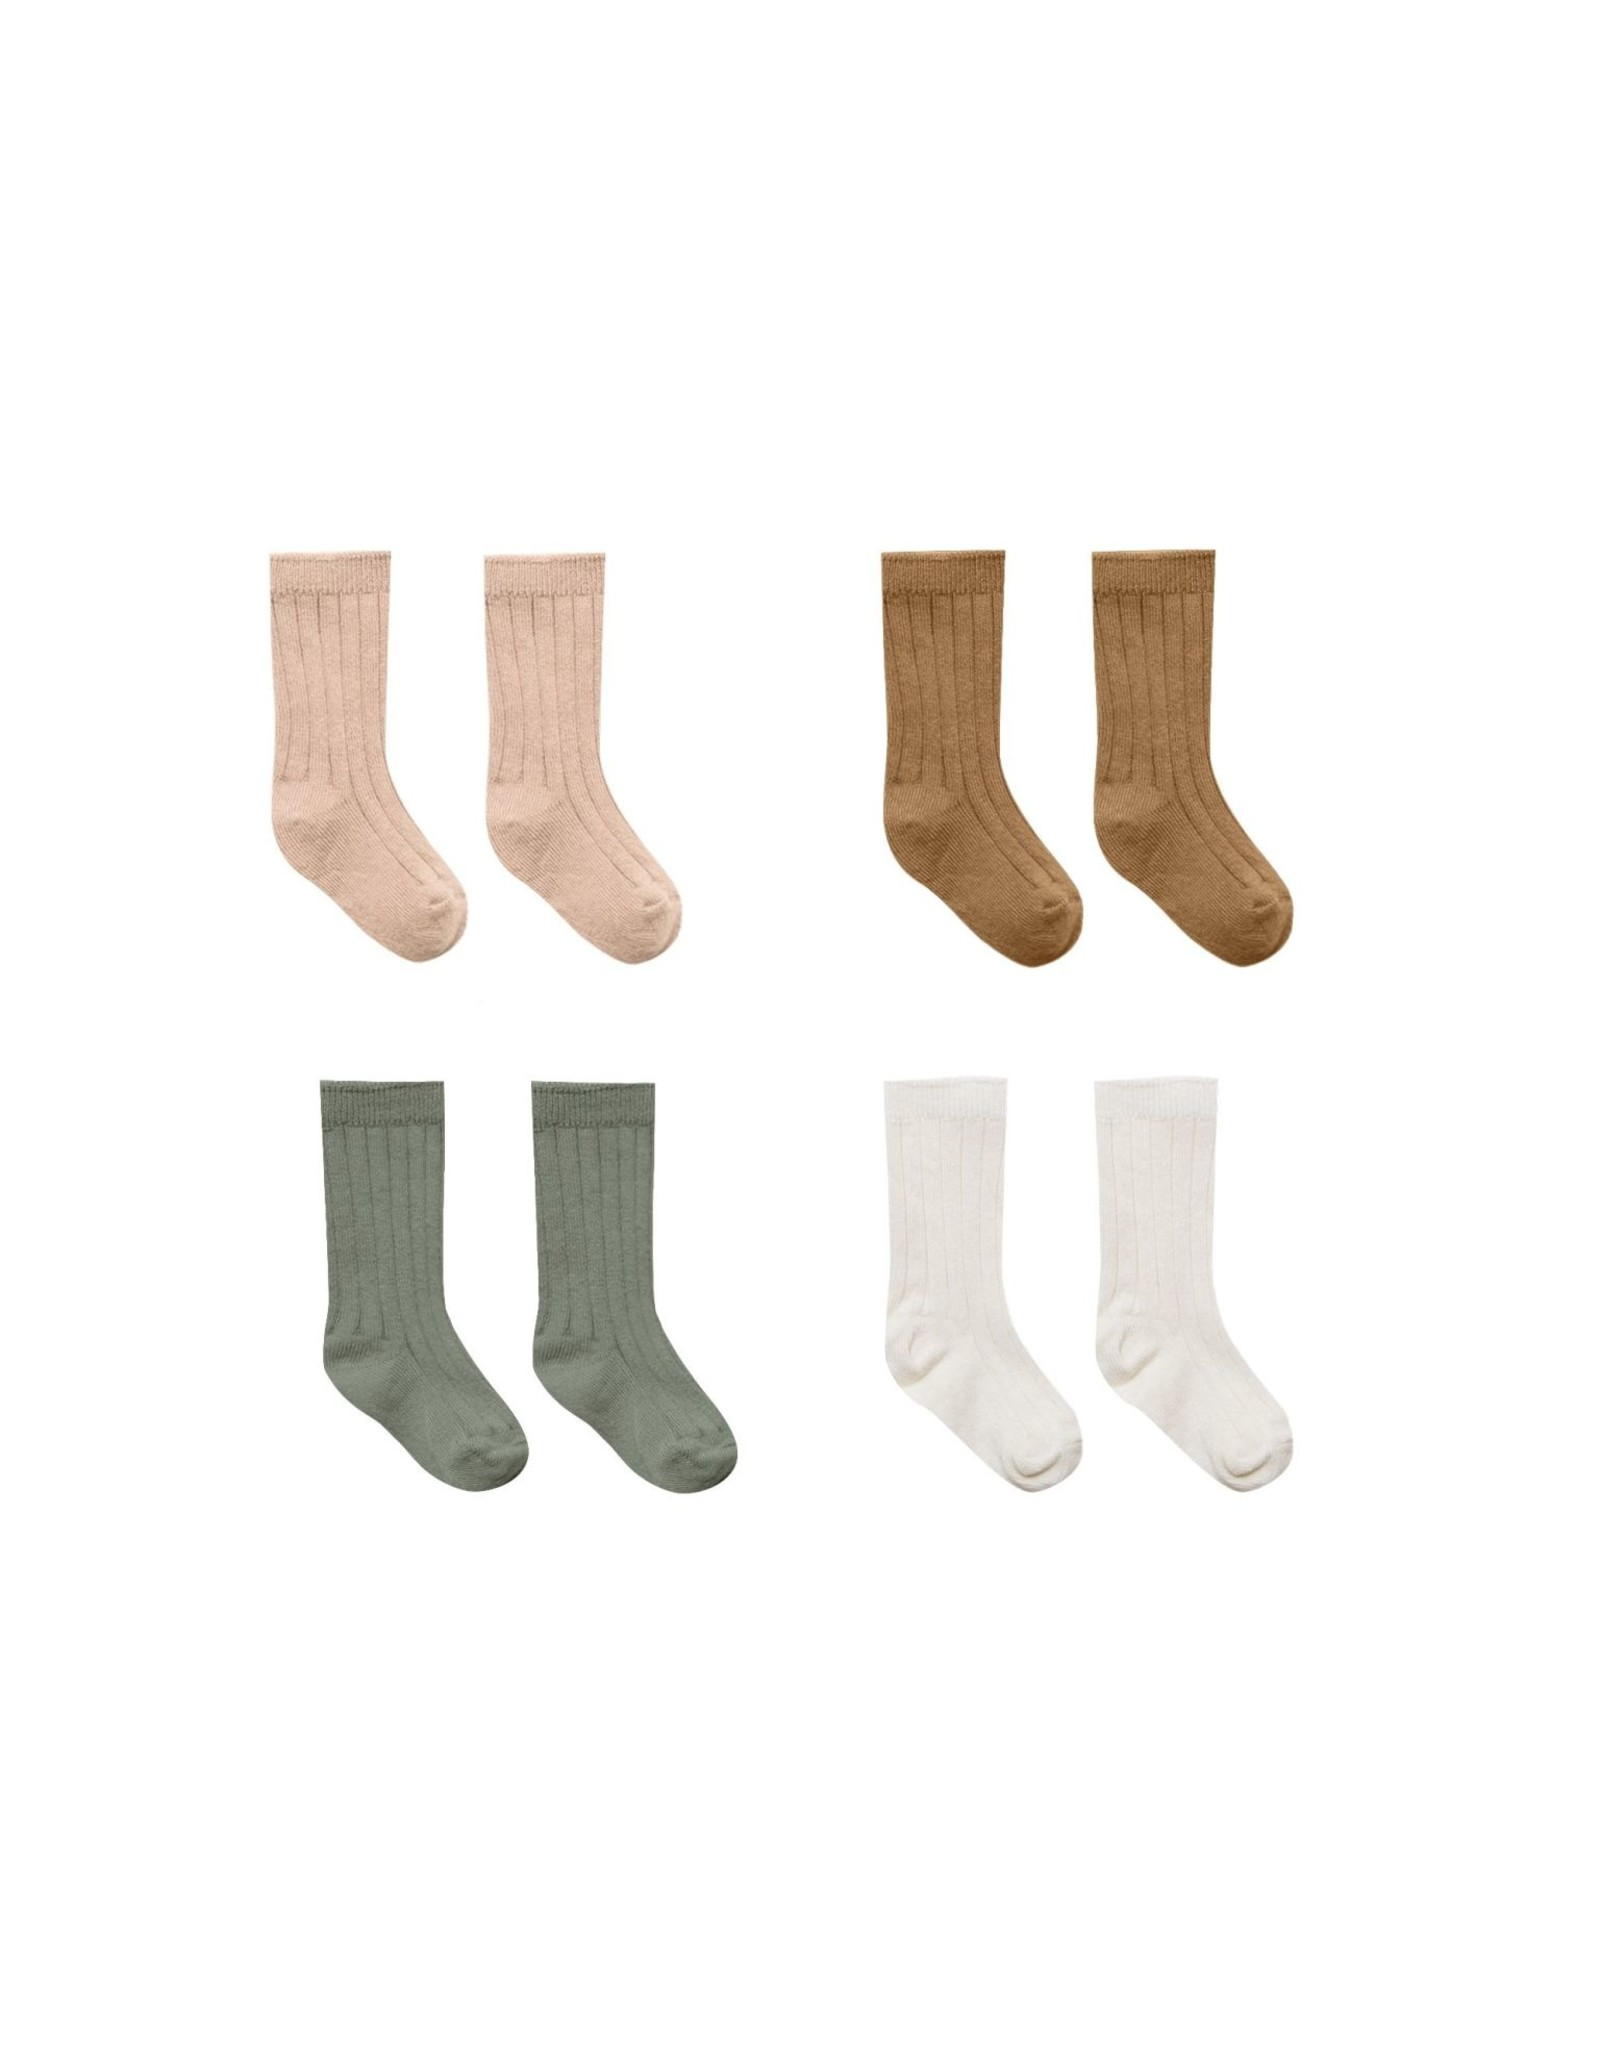 Quincy Mae socks set